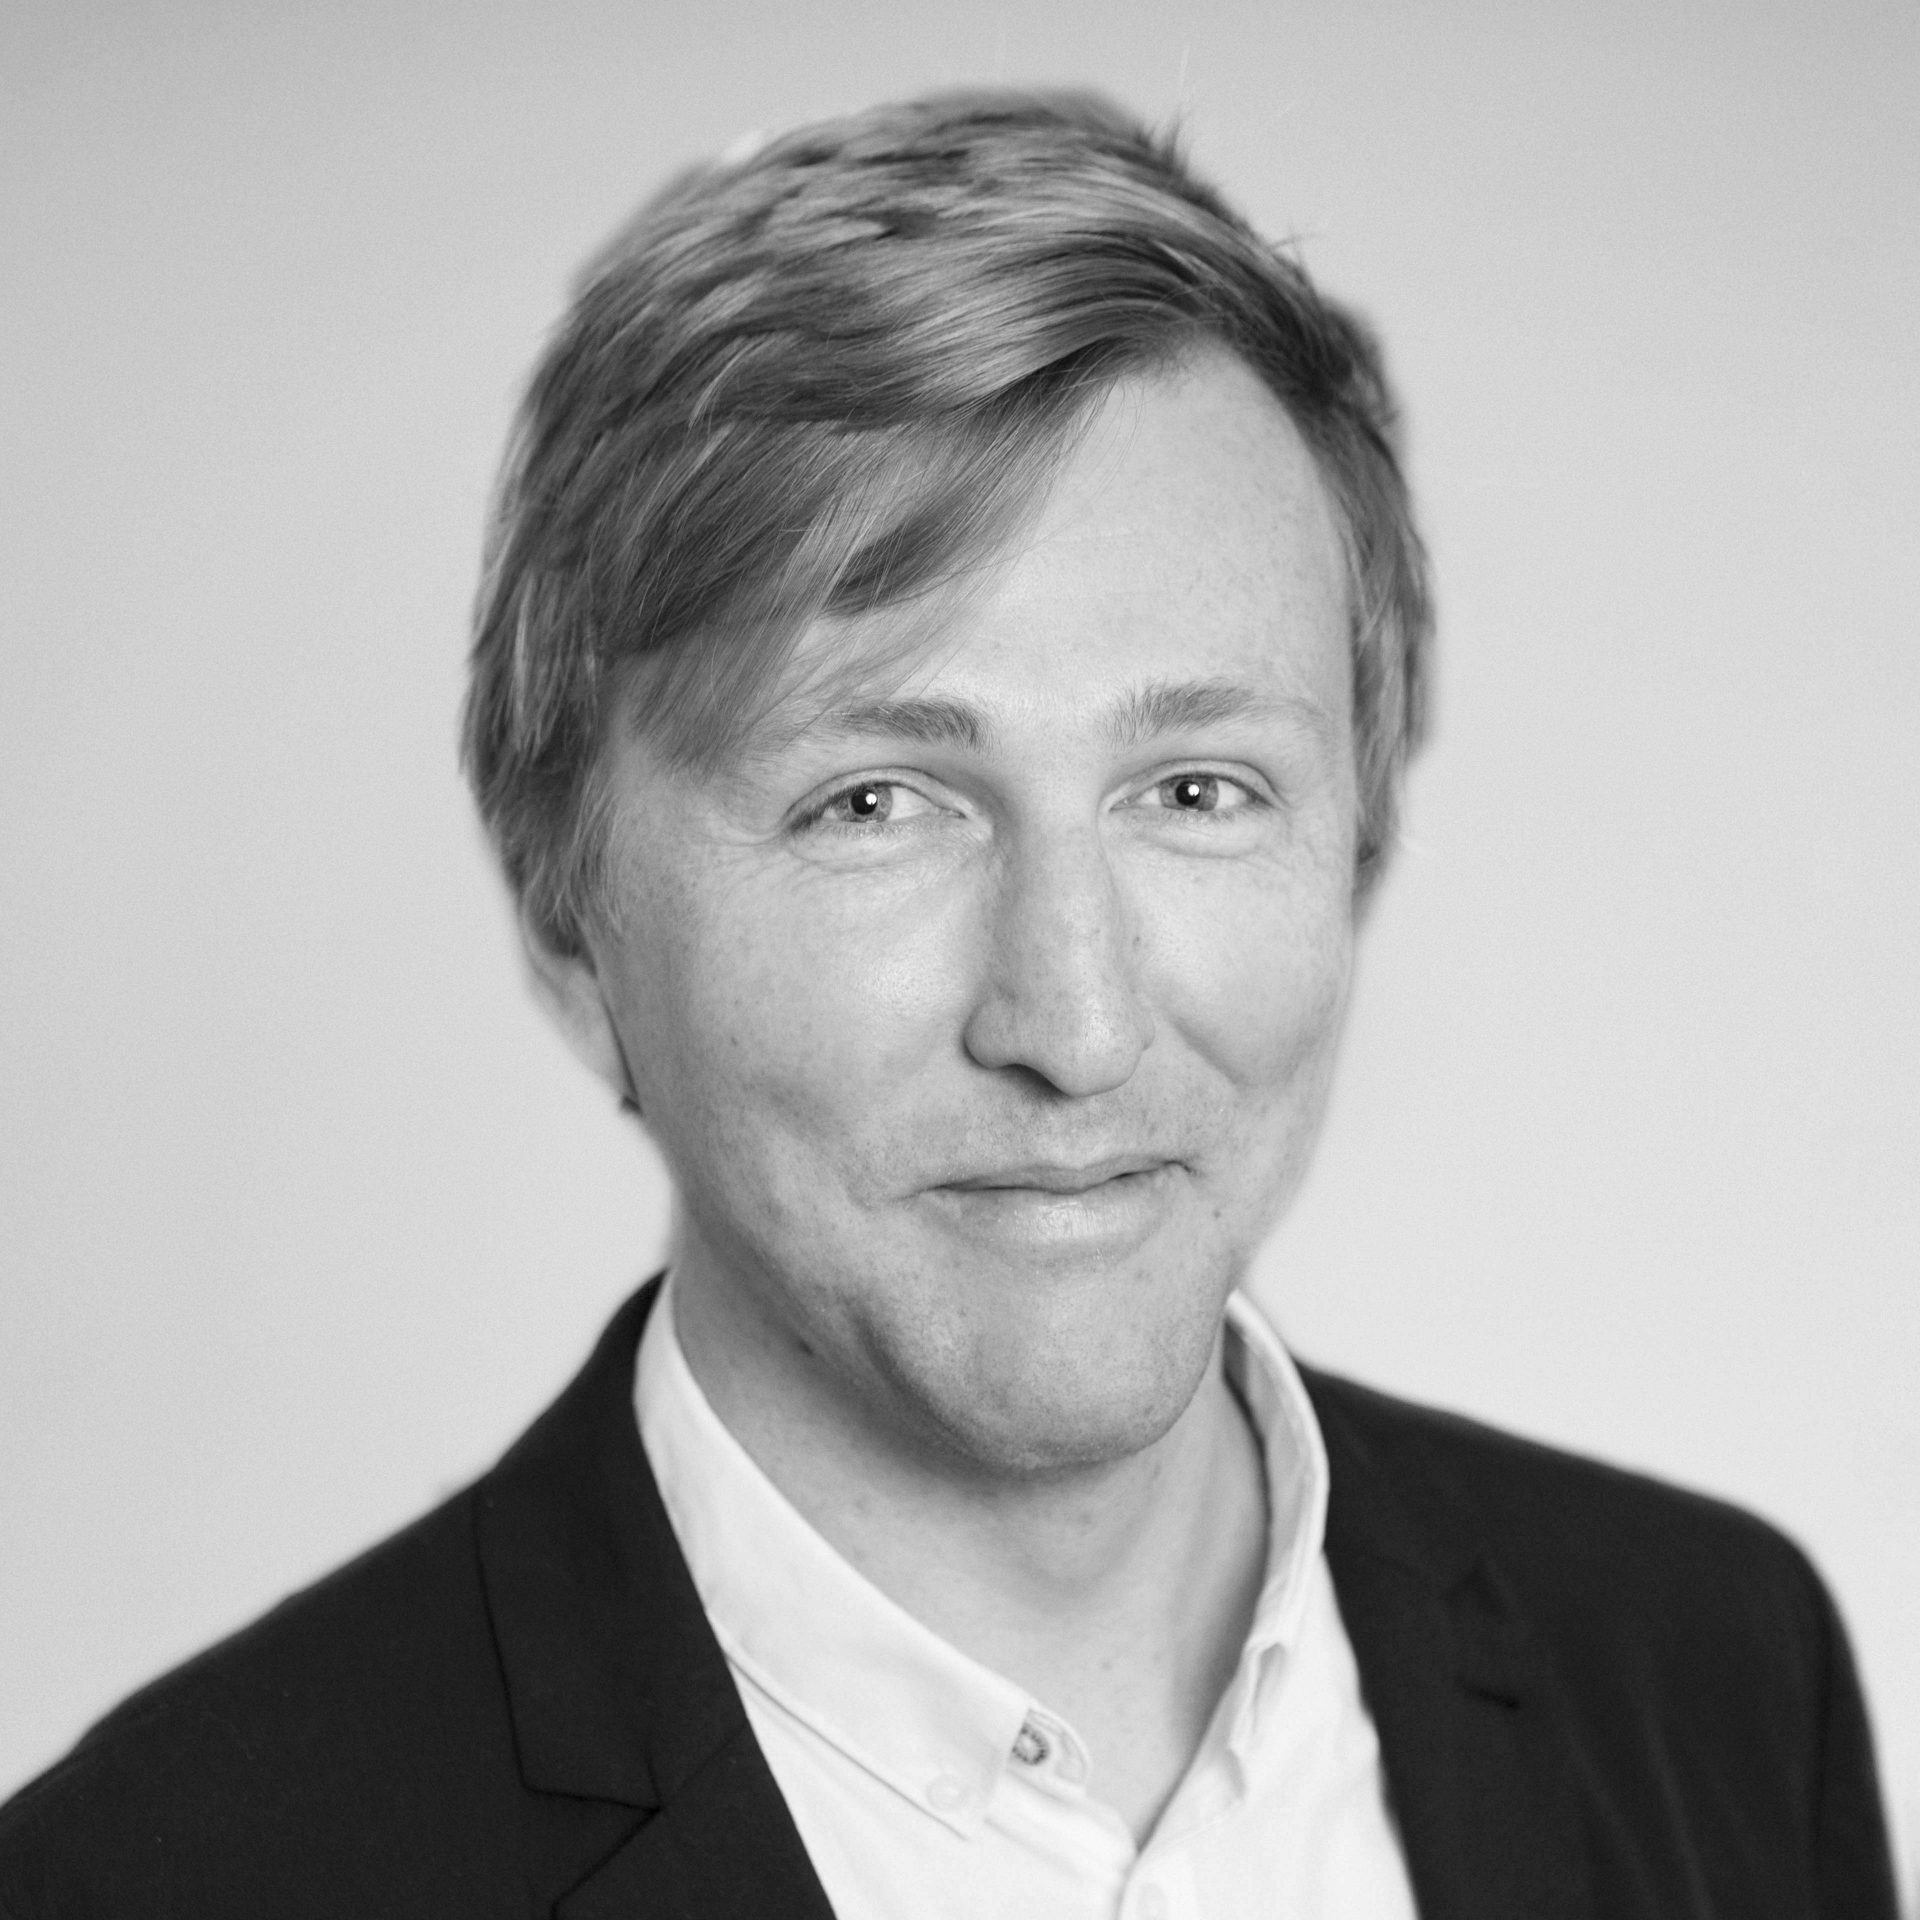 https://ksrarchitects.com/wp-content/uploads/2020/12/Sam-Cooke-Square-scaled.jpg